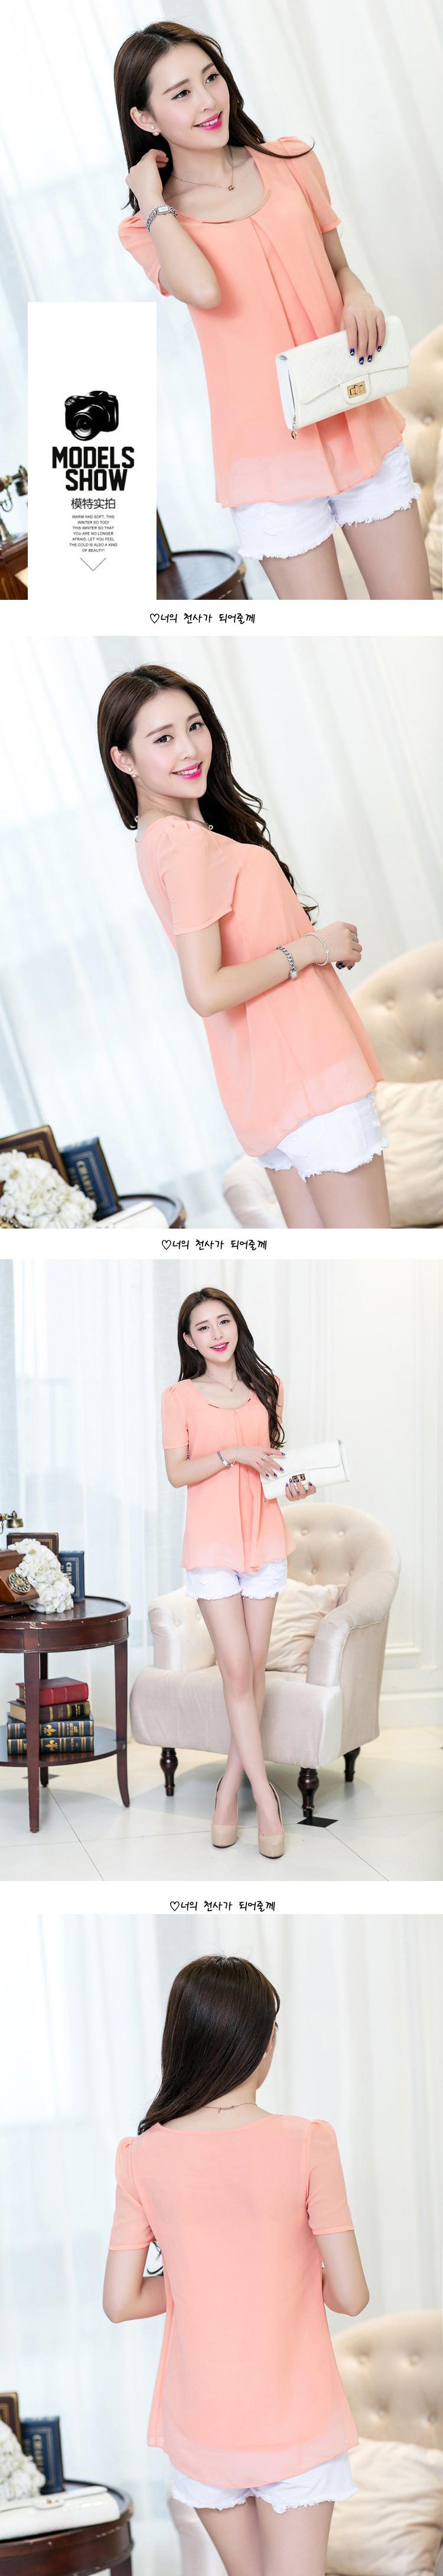 HTB1M0M PVXXXXc apXXq6xXFXXXf - Women's Chiffon Blouse Shirt 2017 Short Sleeve Plus Size 3XL